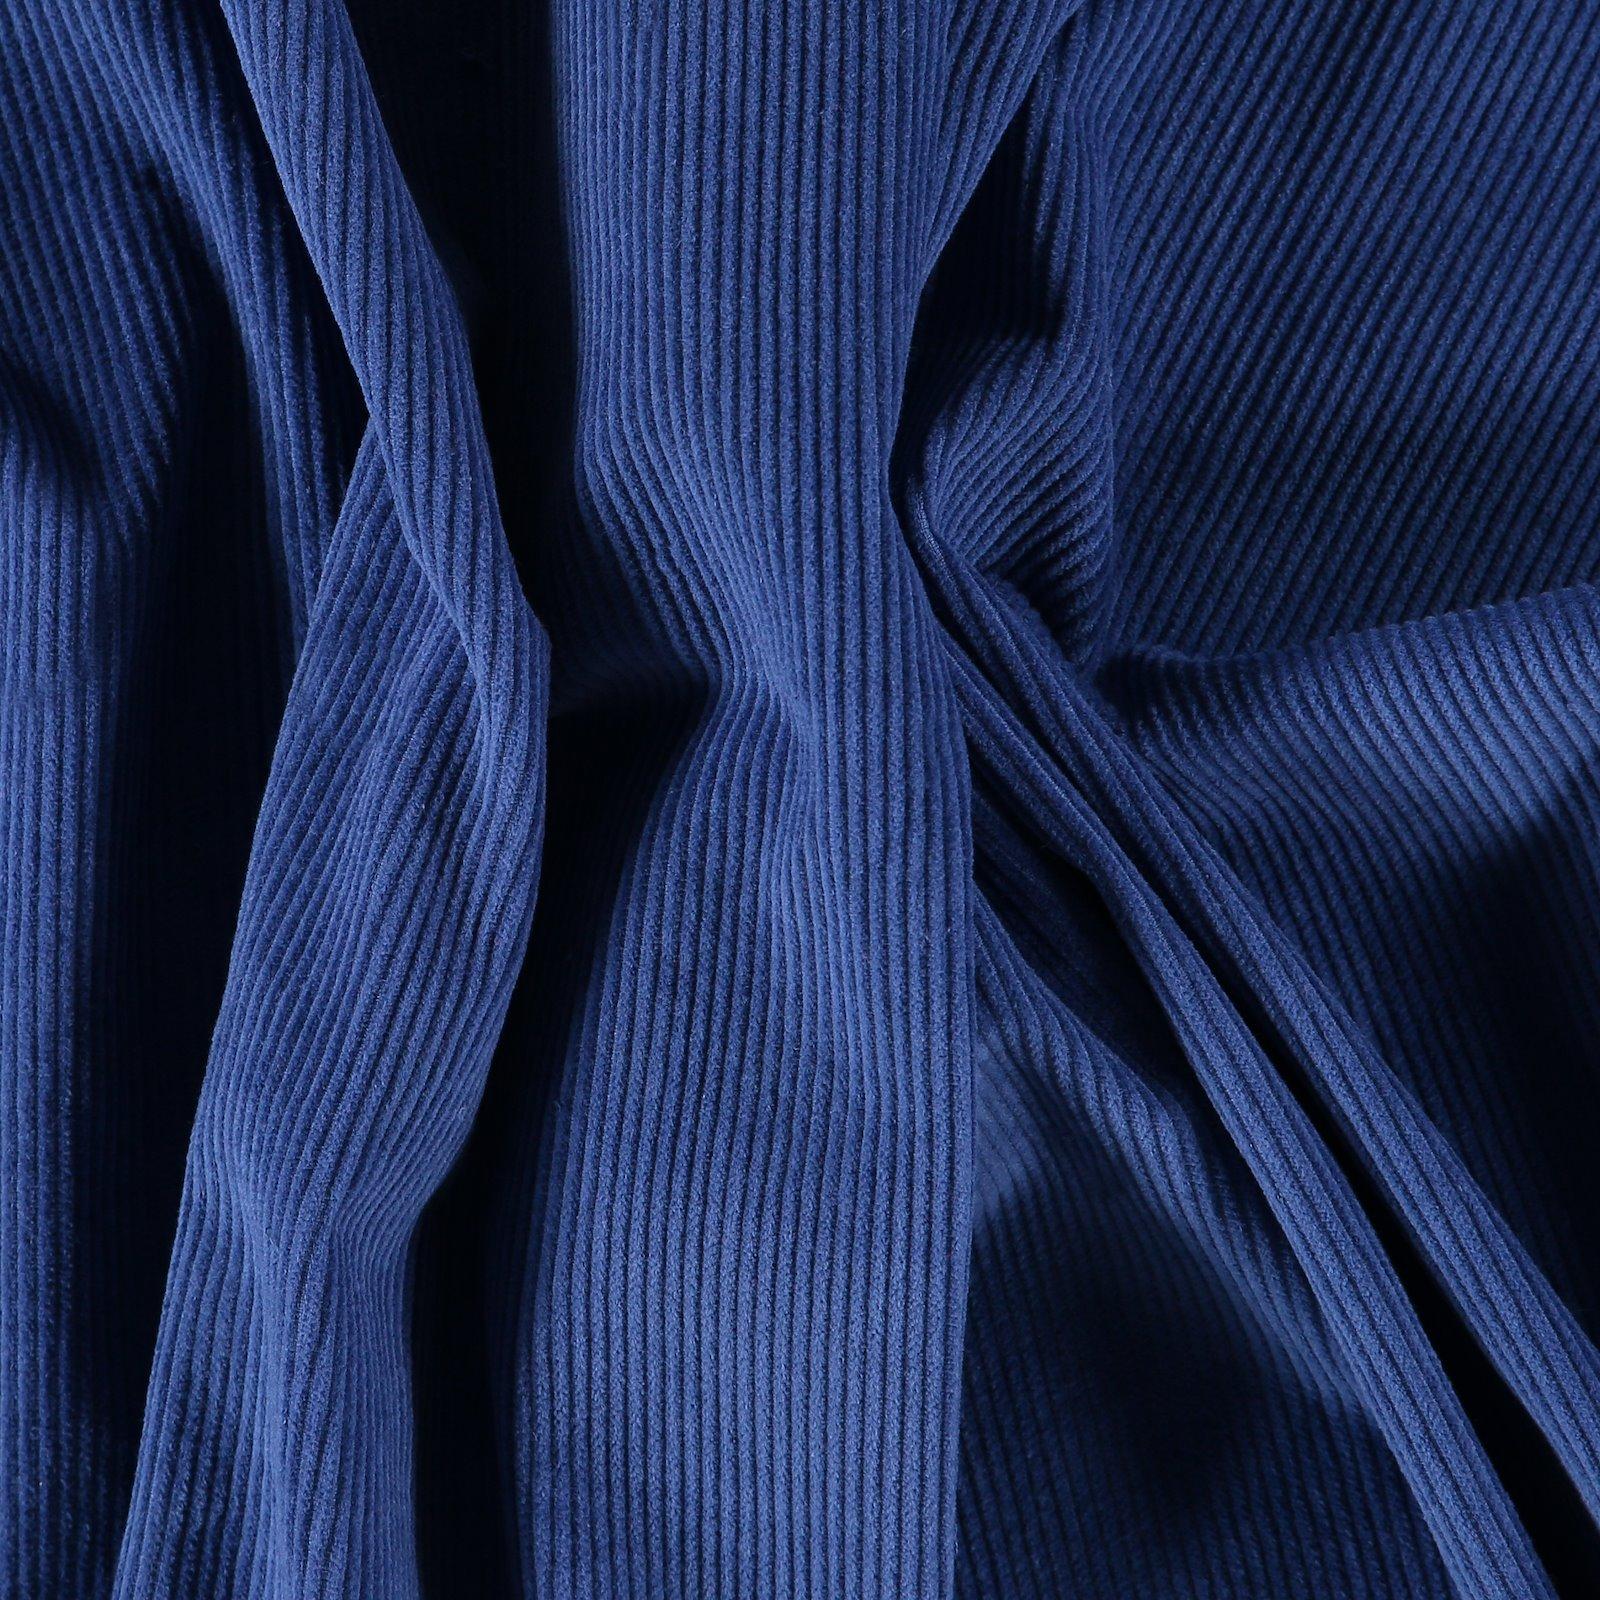 Corduroy 8 wales dark cobalt blue